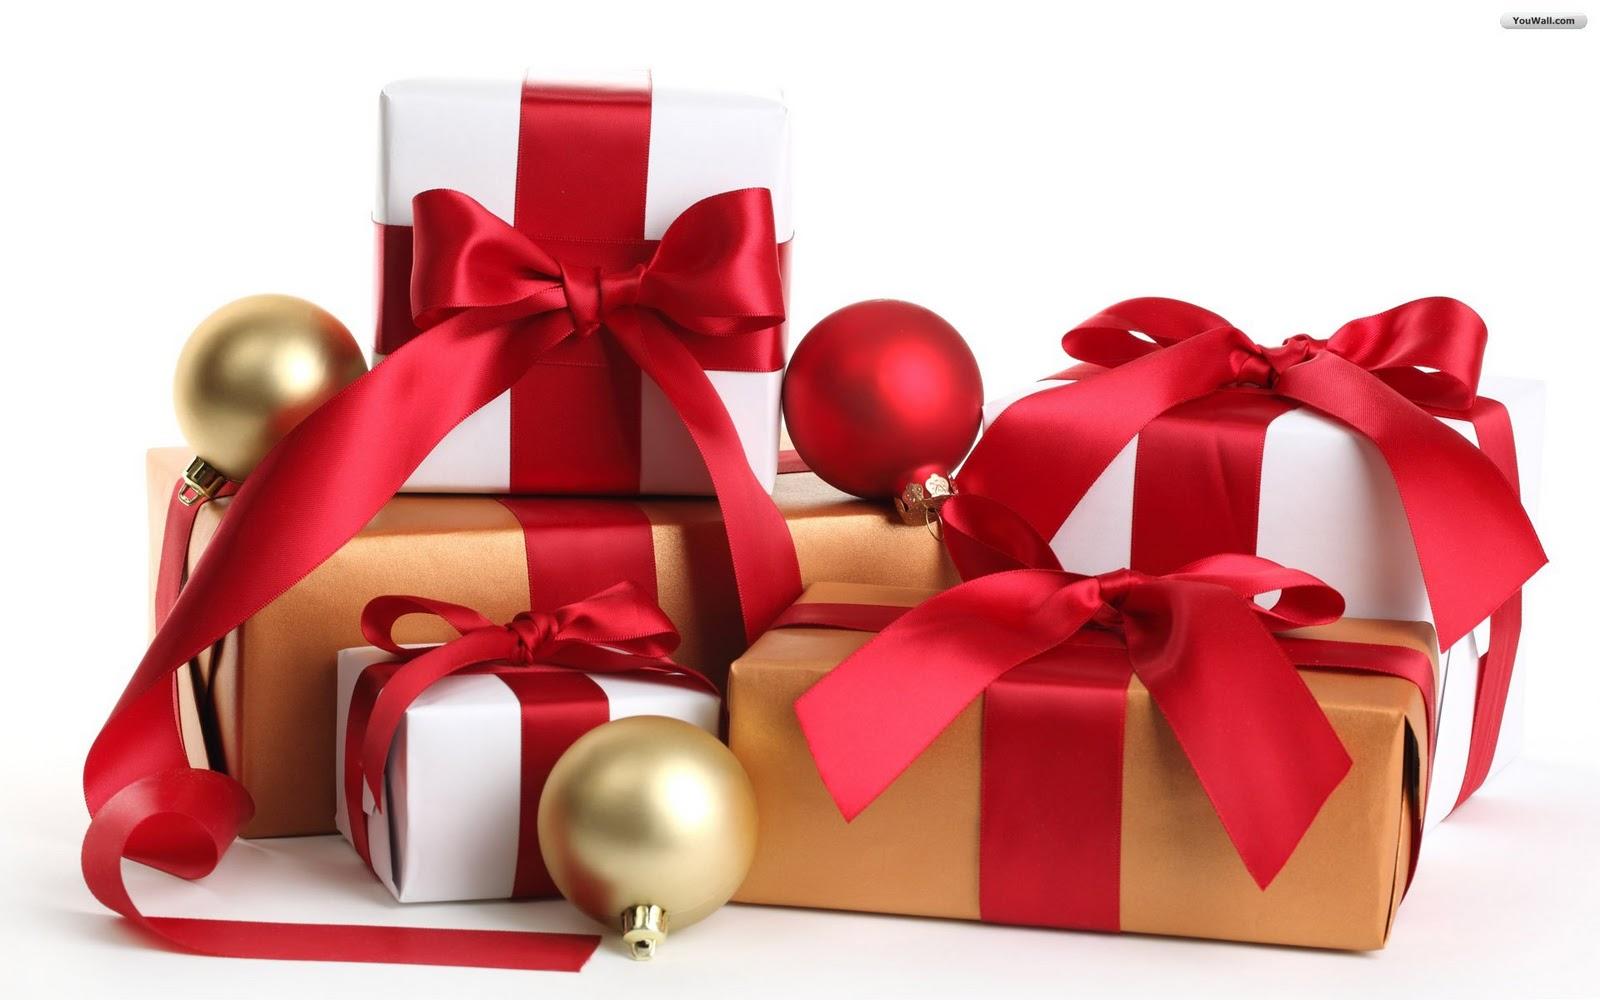 MY SPIRITUAL JOURNEY: Christmas Gifts